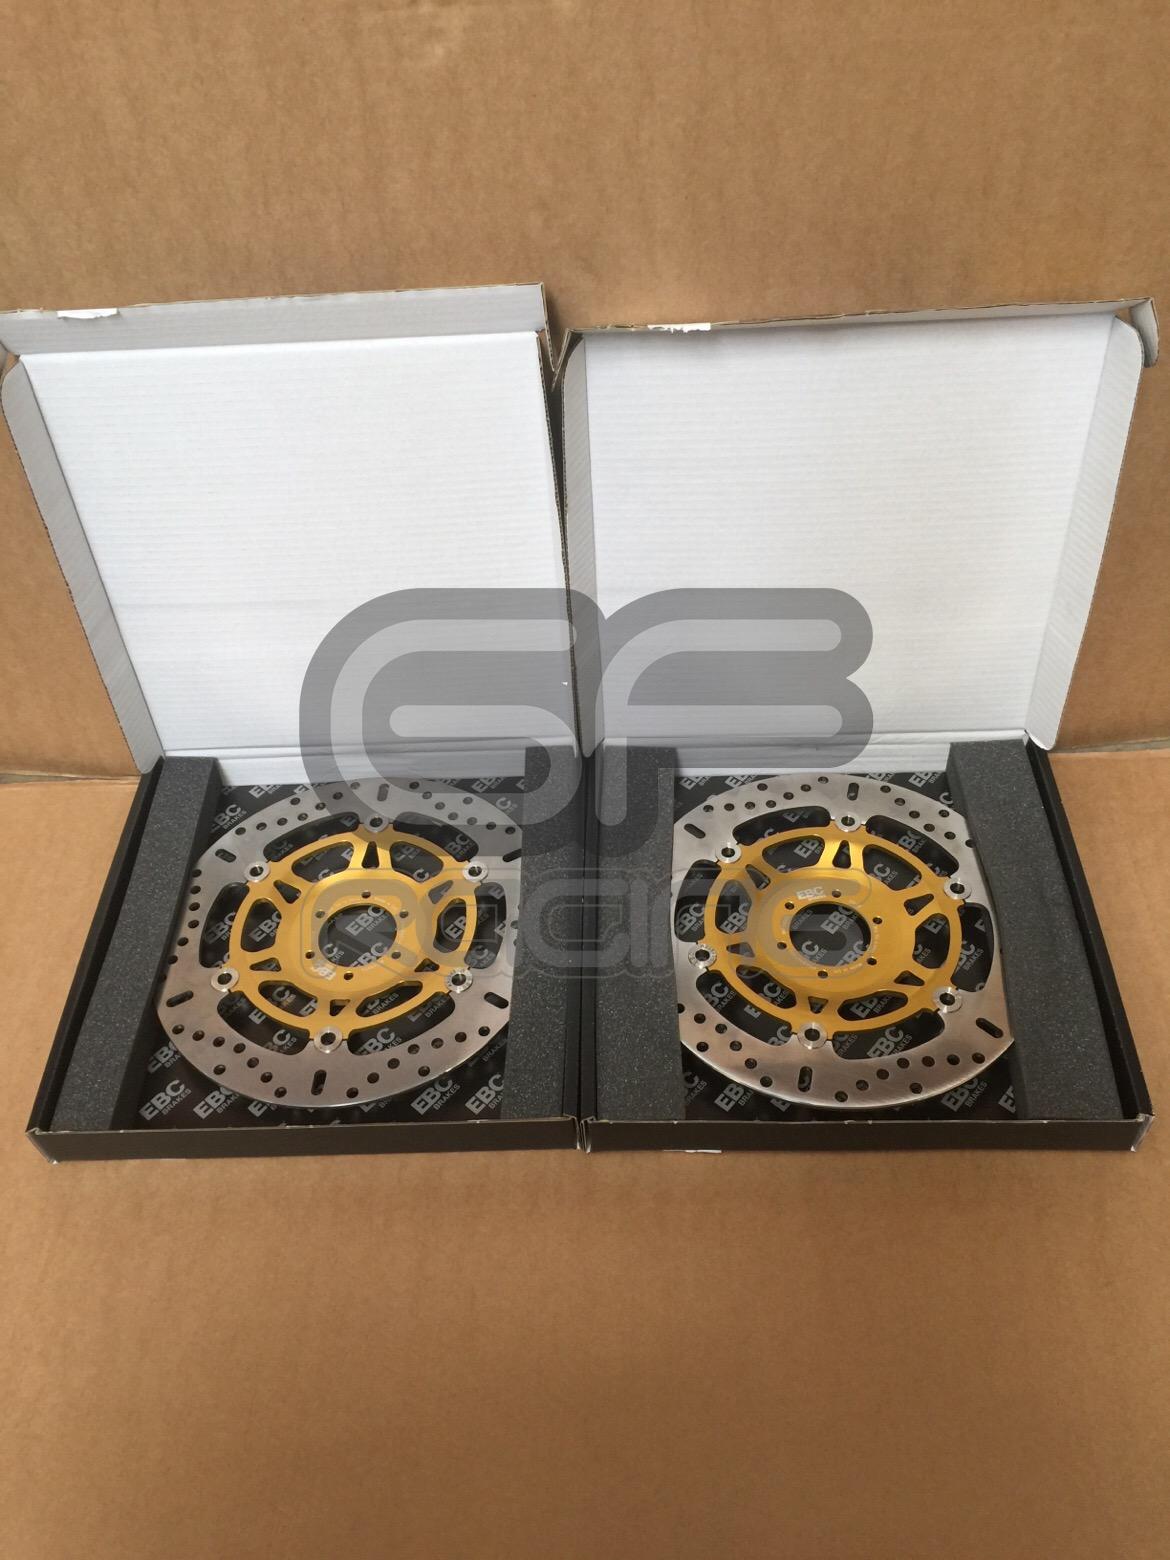 MD1003X EBC Front Brake Discs CBR400 NC23 NC29 VFR400 NC30 RVF400 NC35